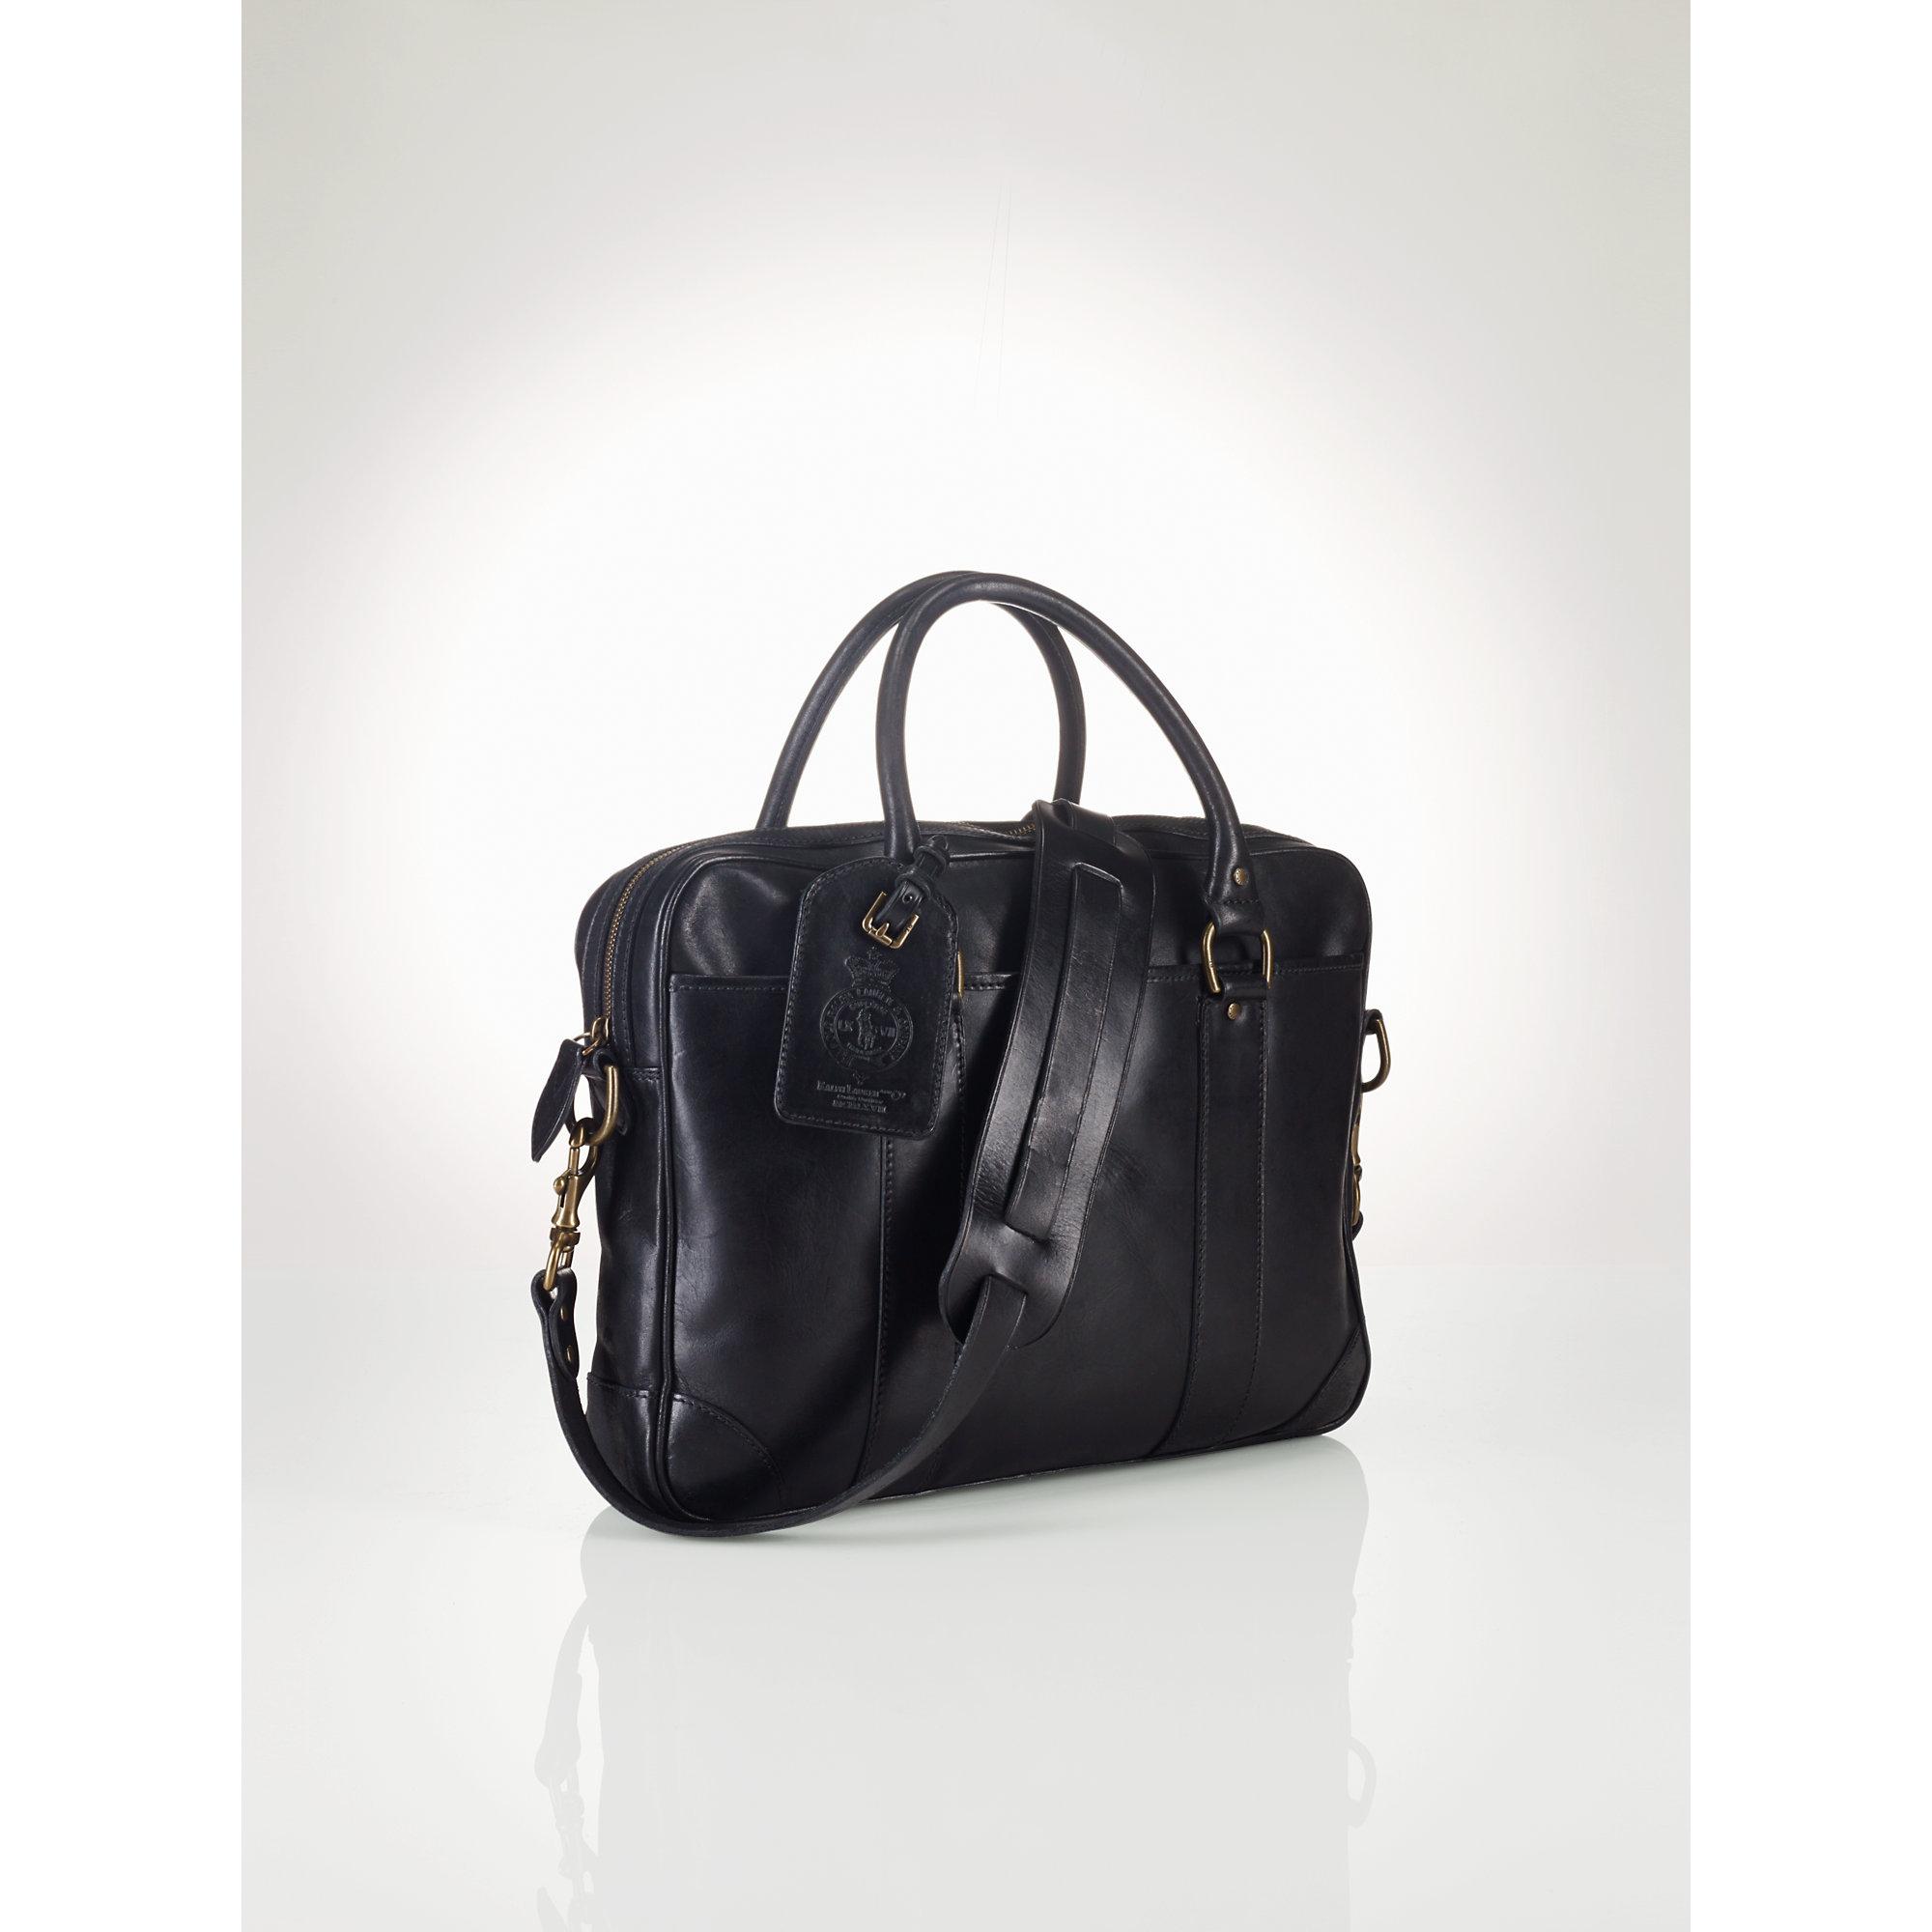 474e01e0188f ... wholesale lyst polo ralph lauren soft leather briefcase in black for men  38dcc bfdd4